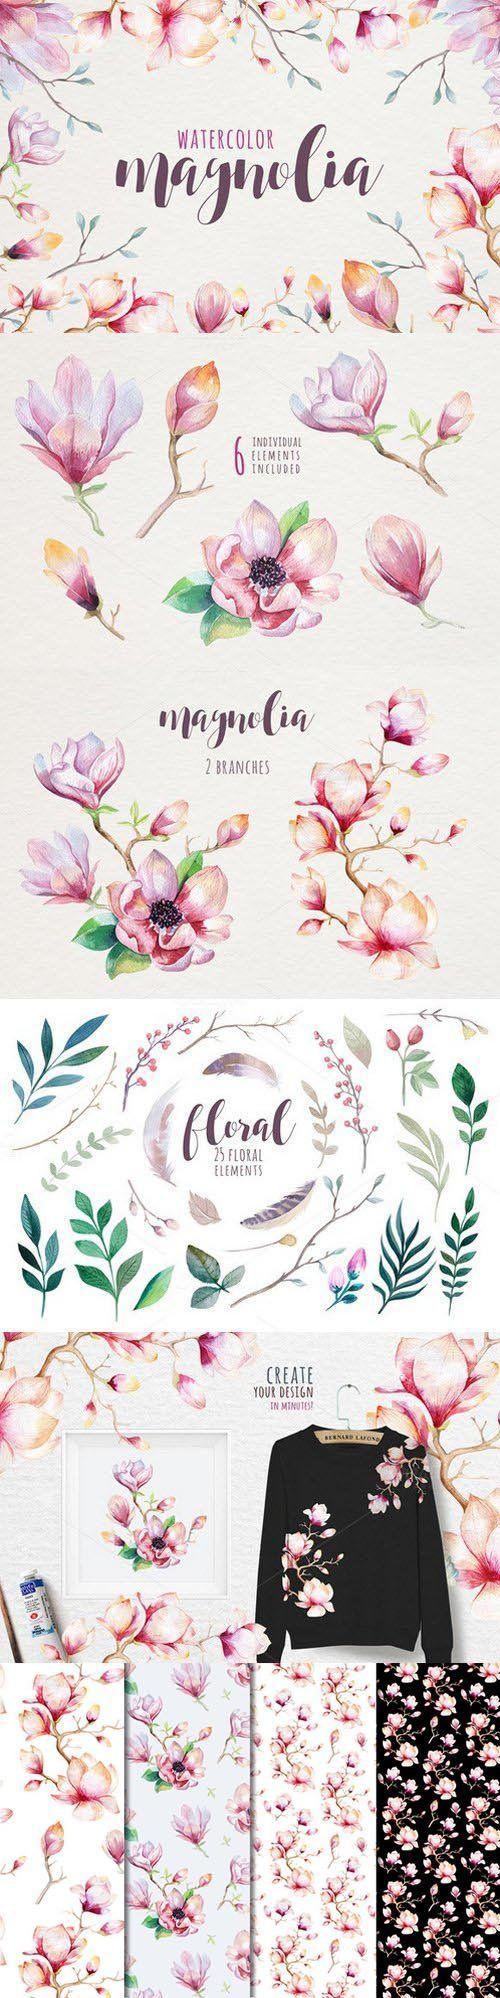 Watercolor magnolia 652998                                                                                                                                                                                 More